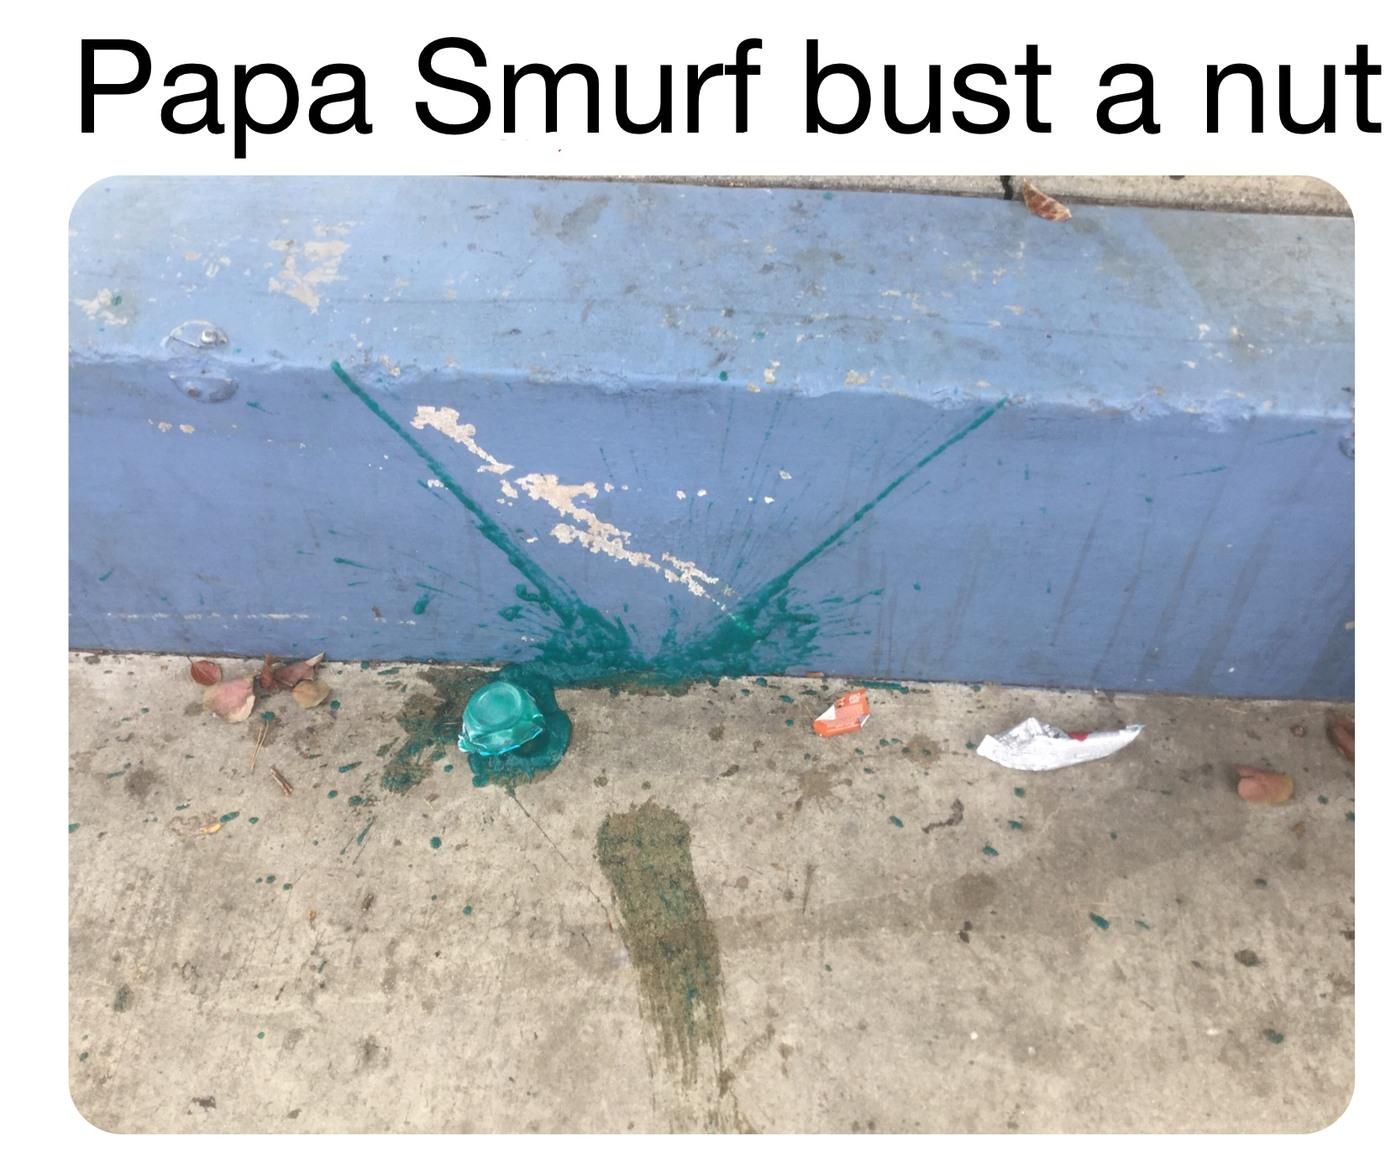 Blue nut - meme